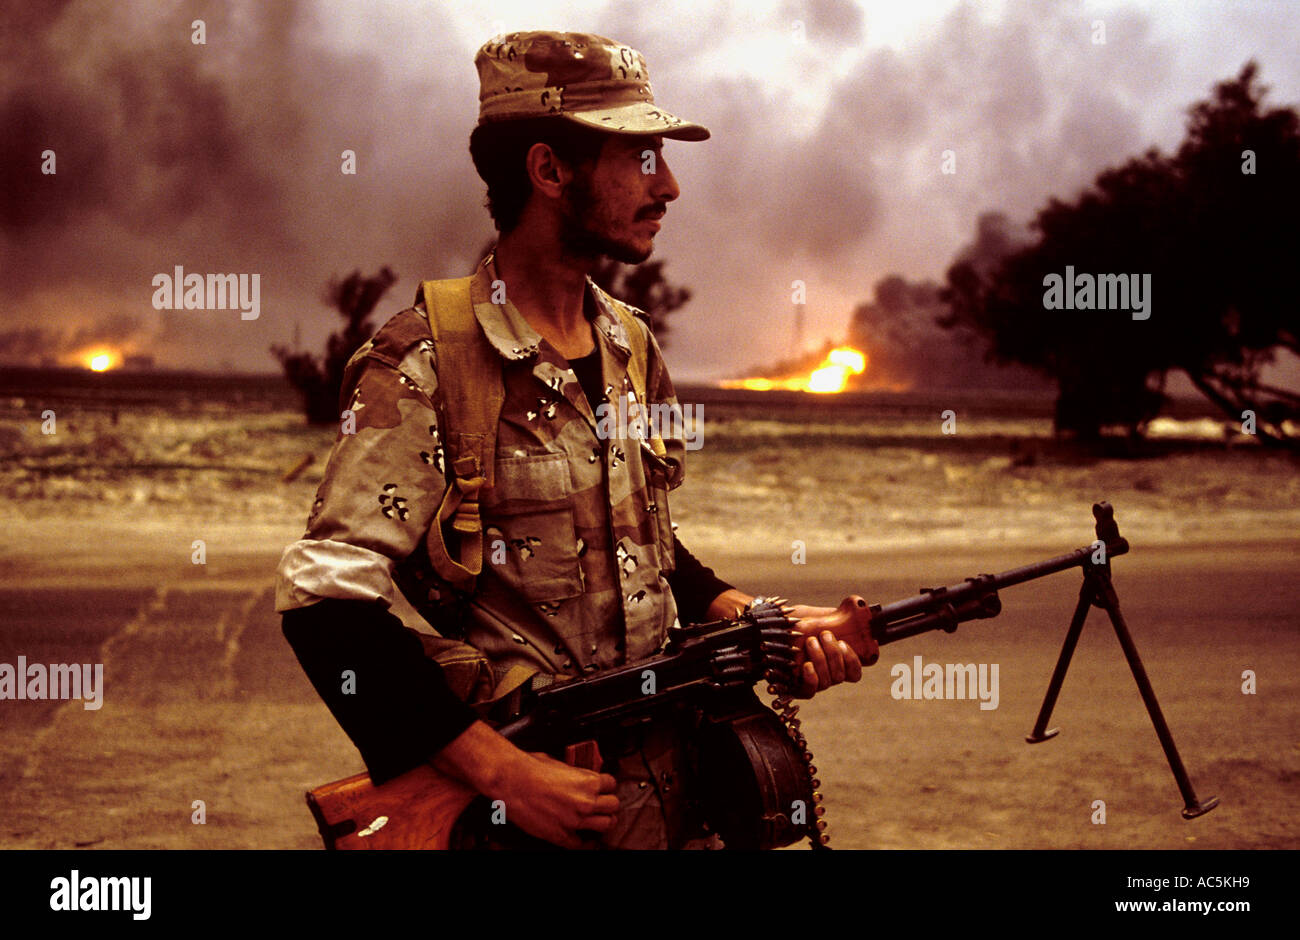 Oil fires near the Iraqi border in war torn kuwait 1991 Stock Photo